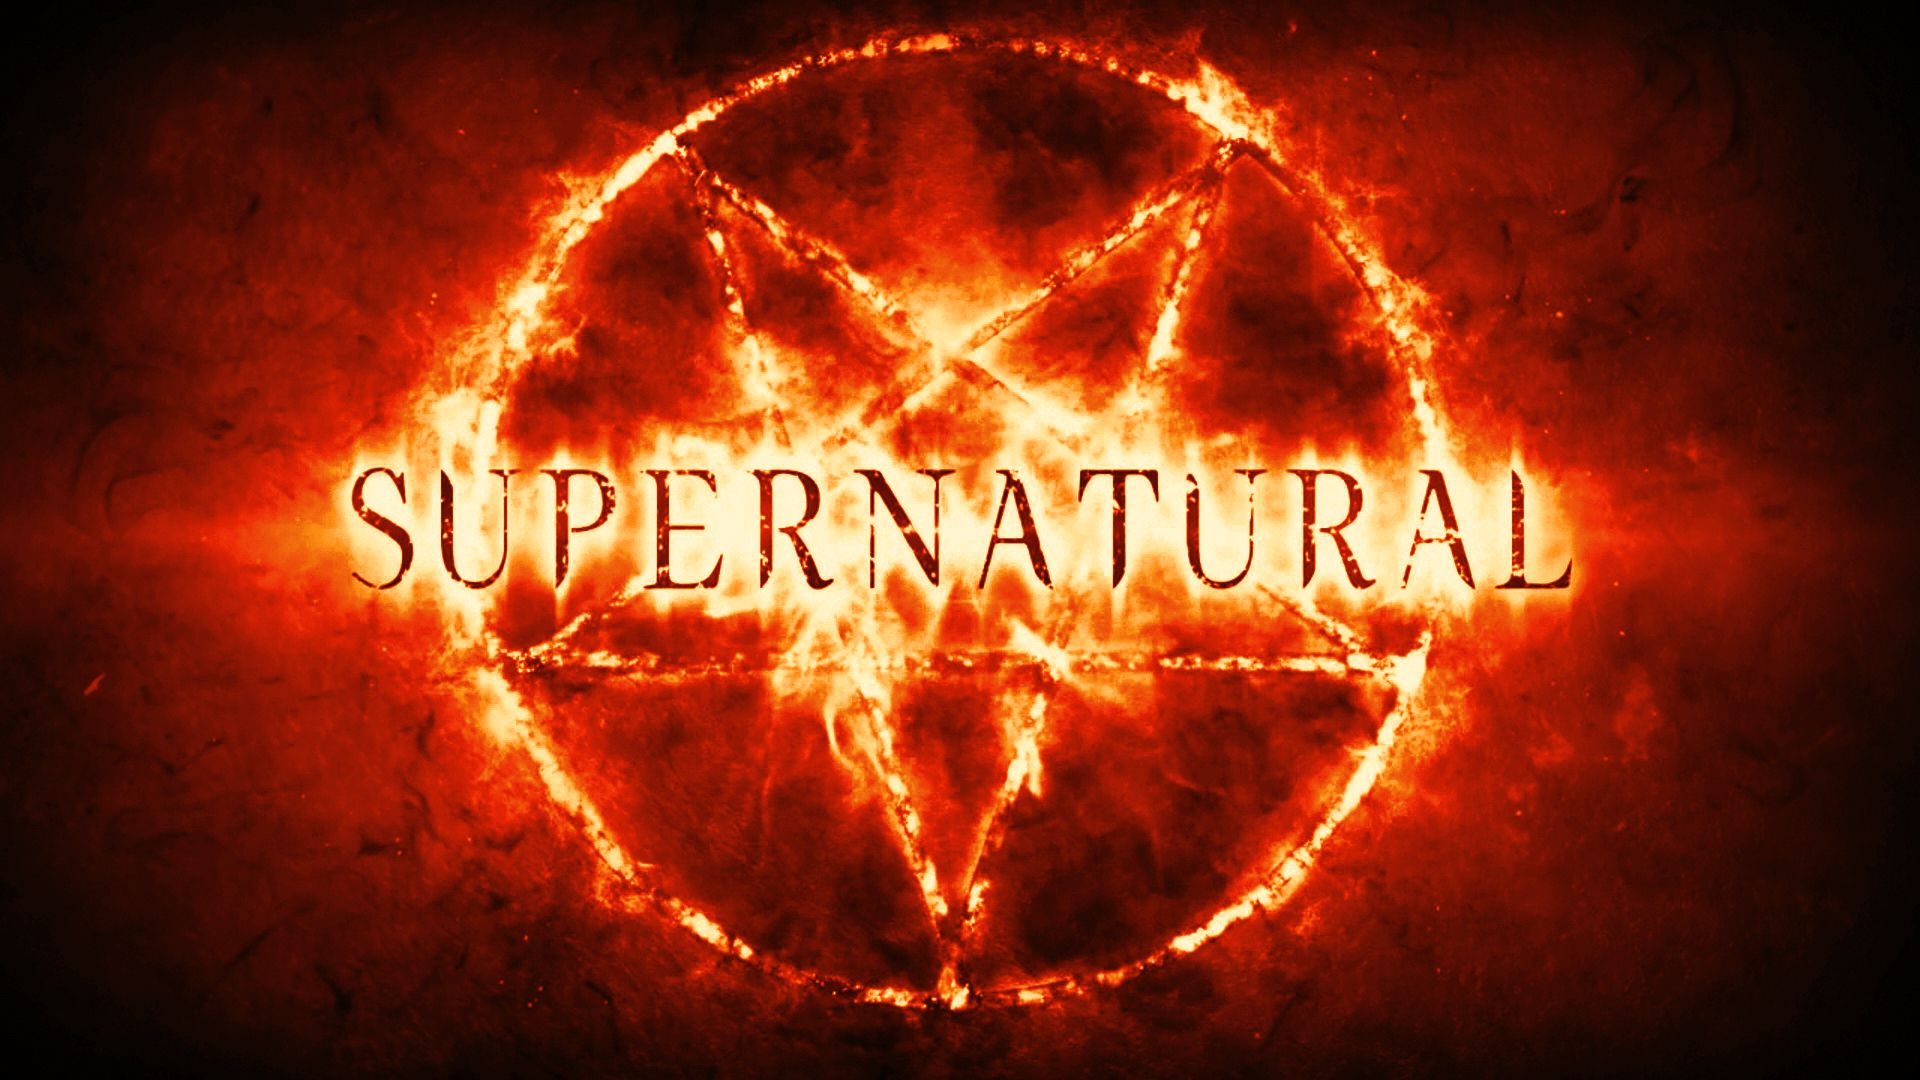 supernatural anti possession wallpaper - Google Search ...